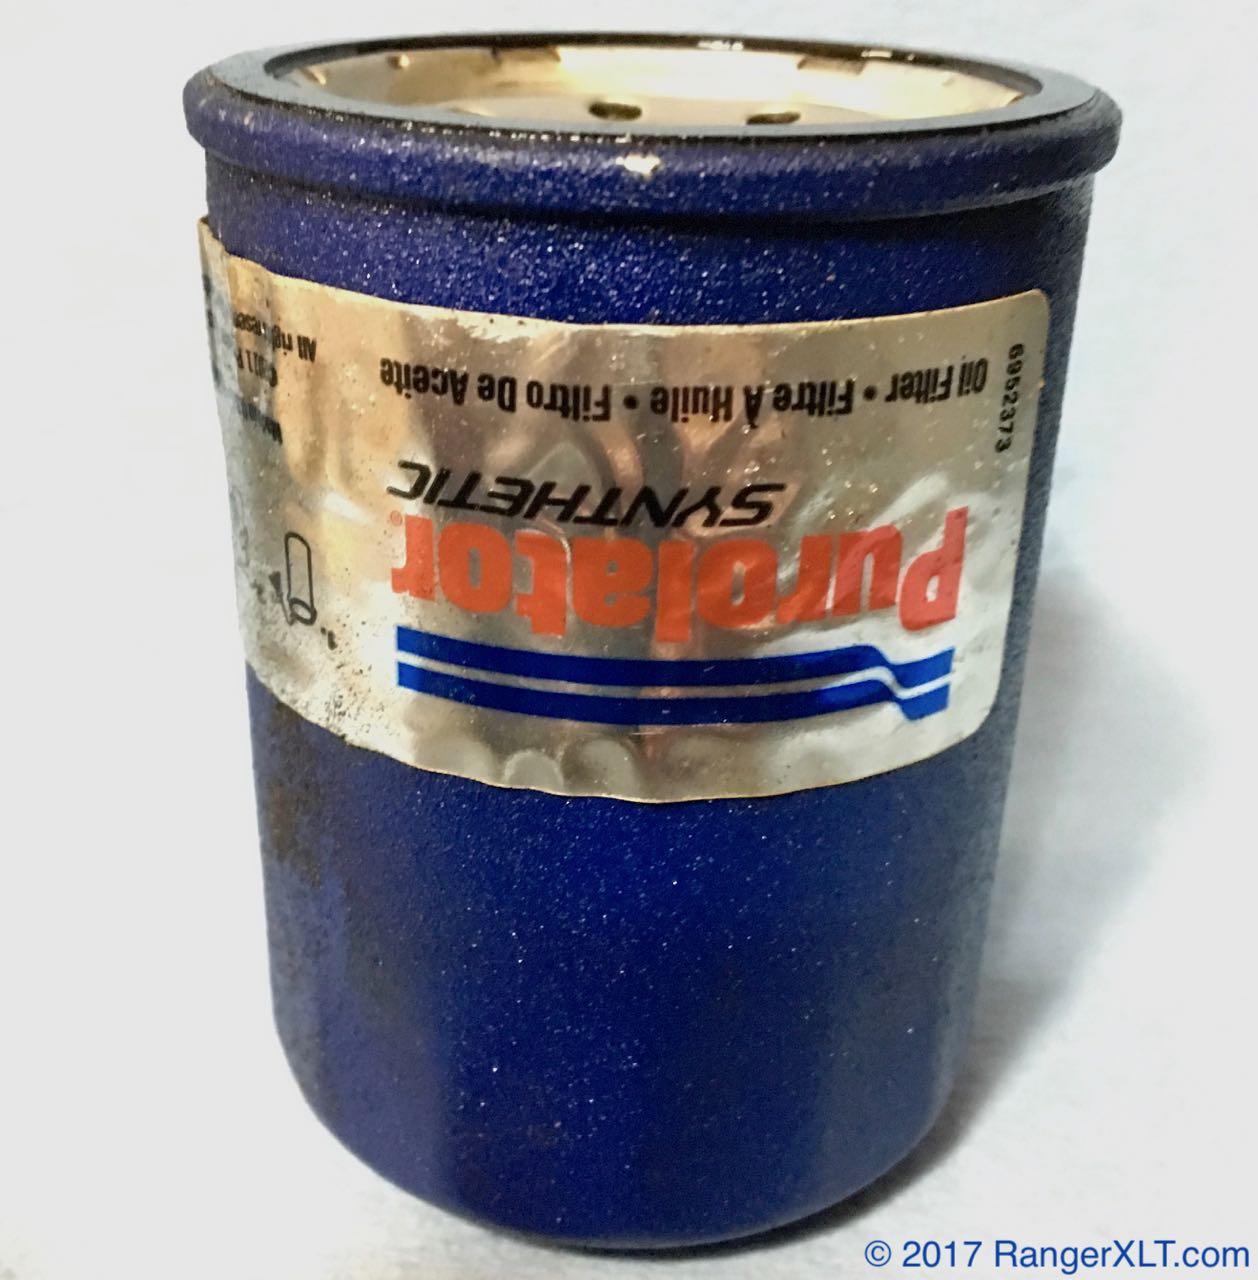 Cut Open] Purolator Synthetic PSL14610 - 5,729 mi - Bob Is